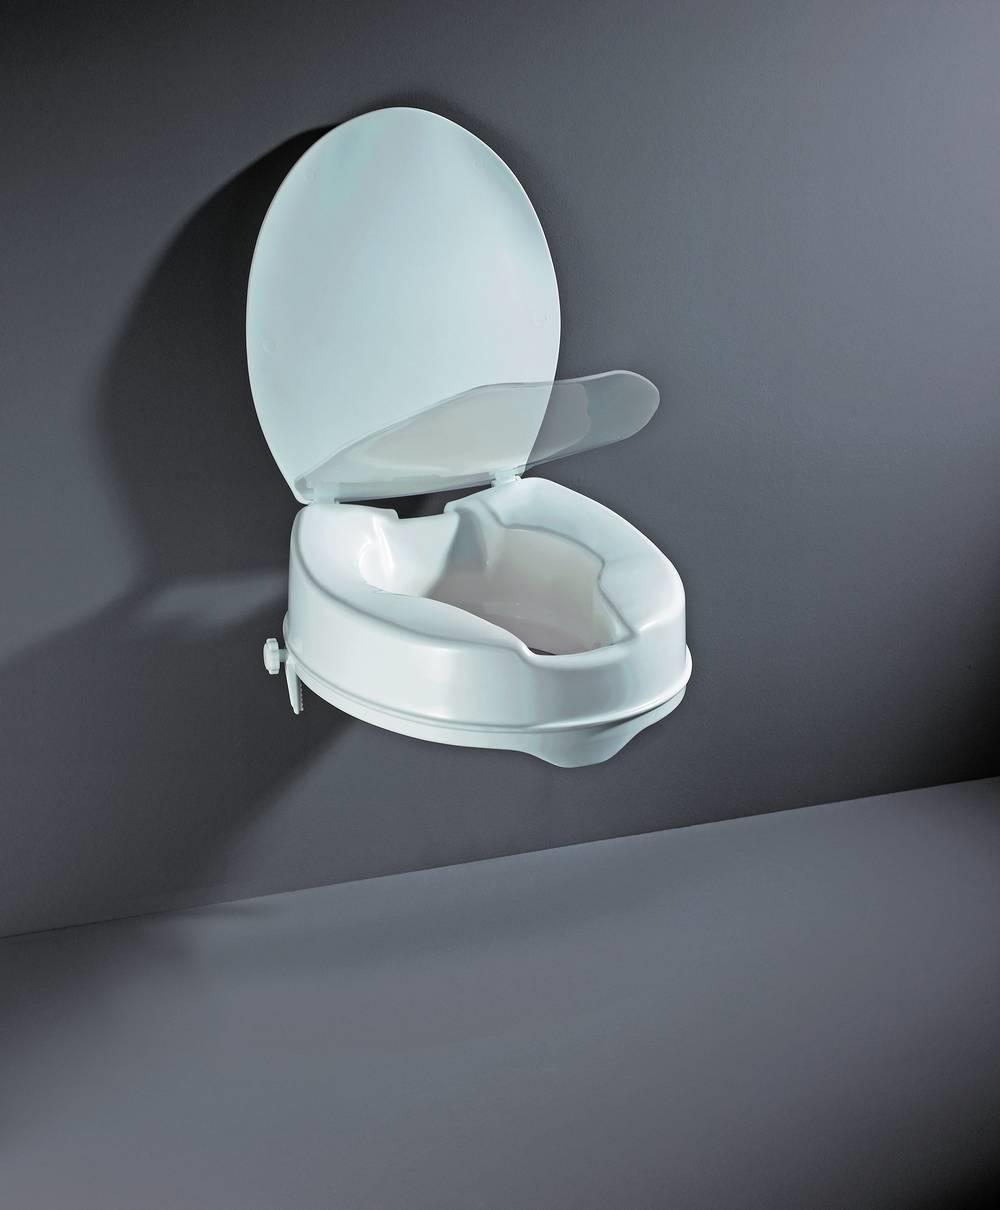 A0071001 Toiletverhoging Wit